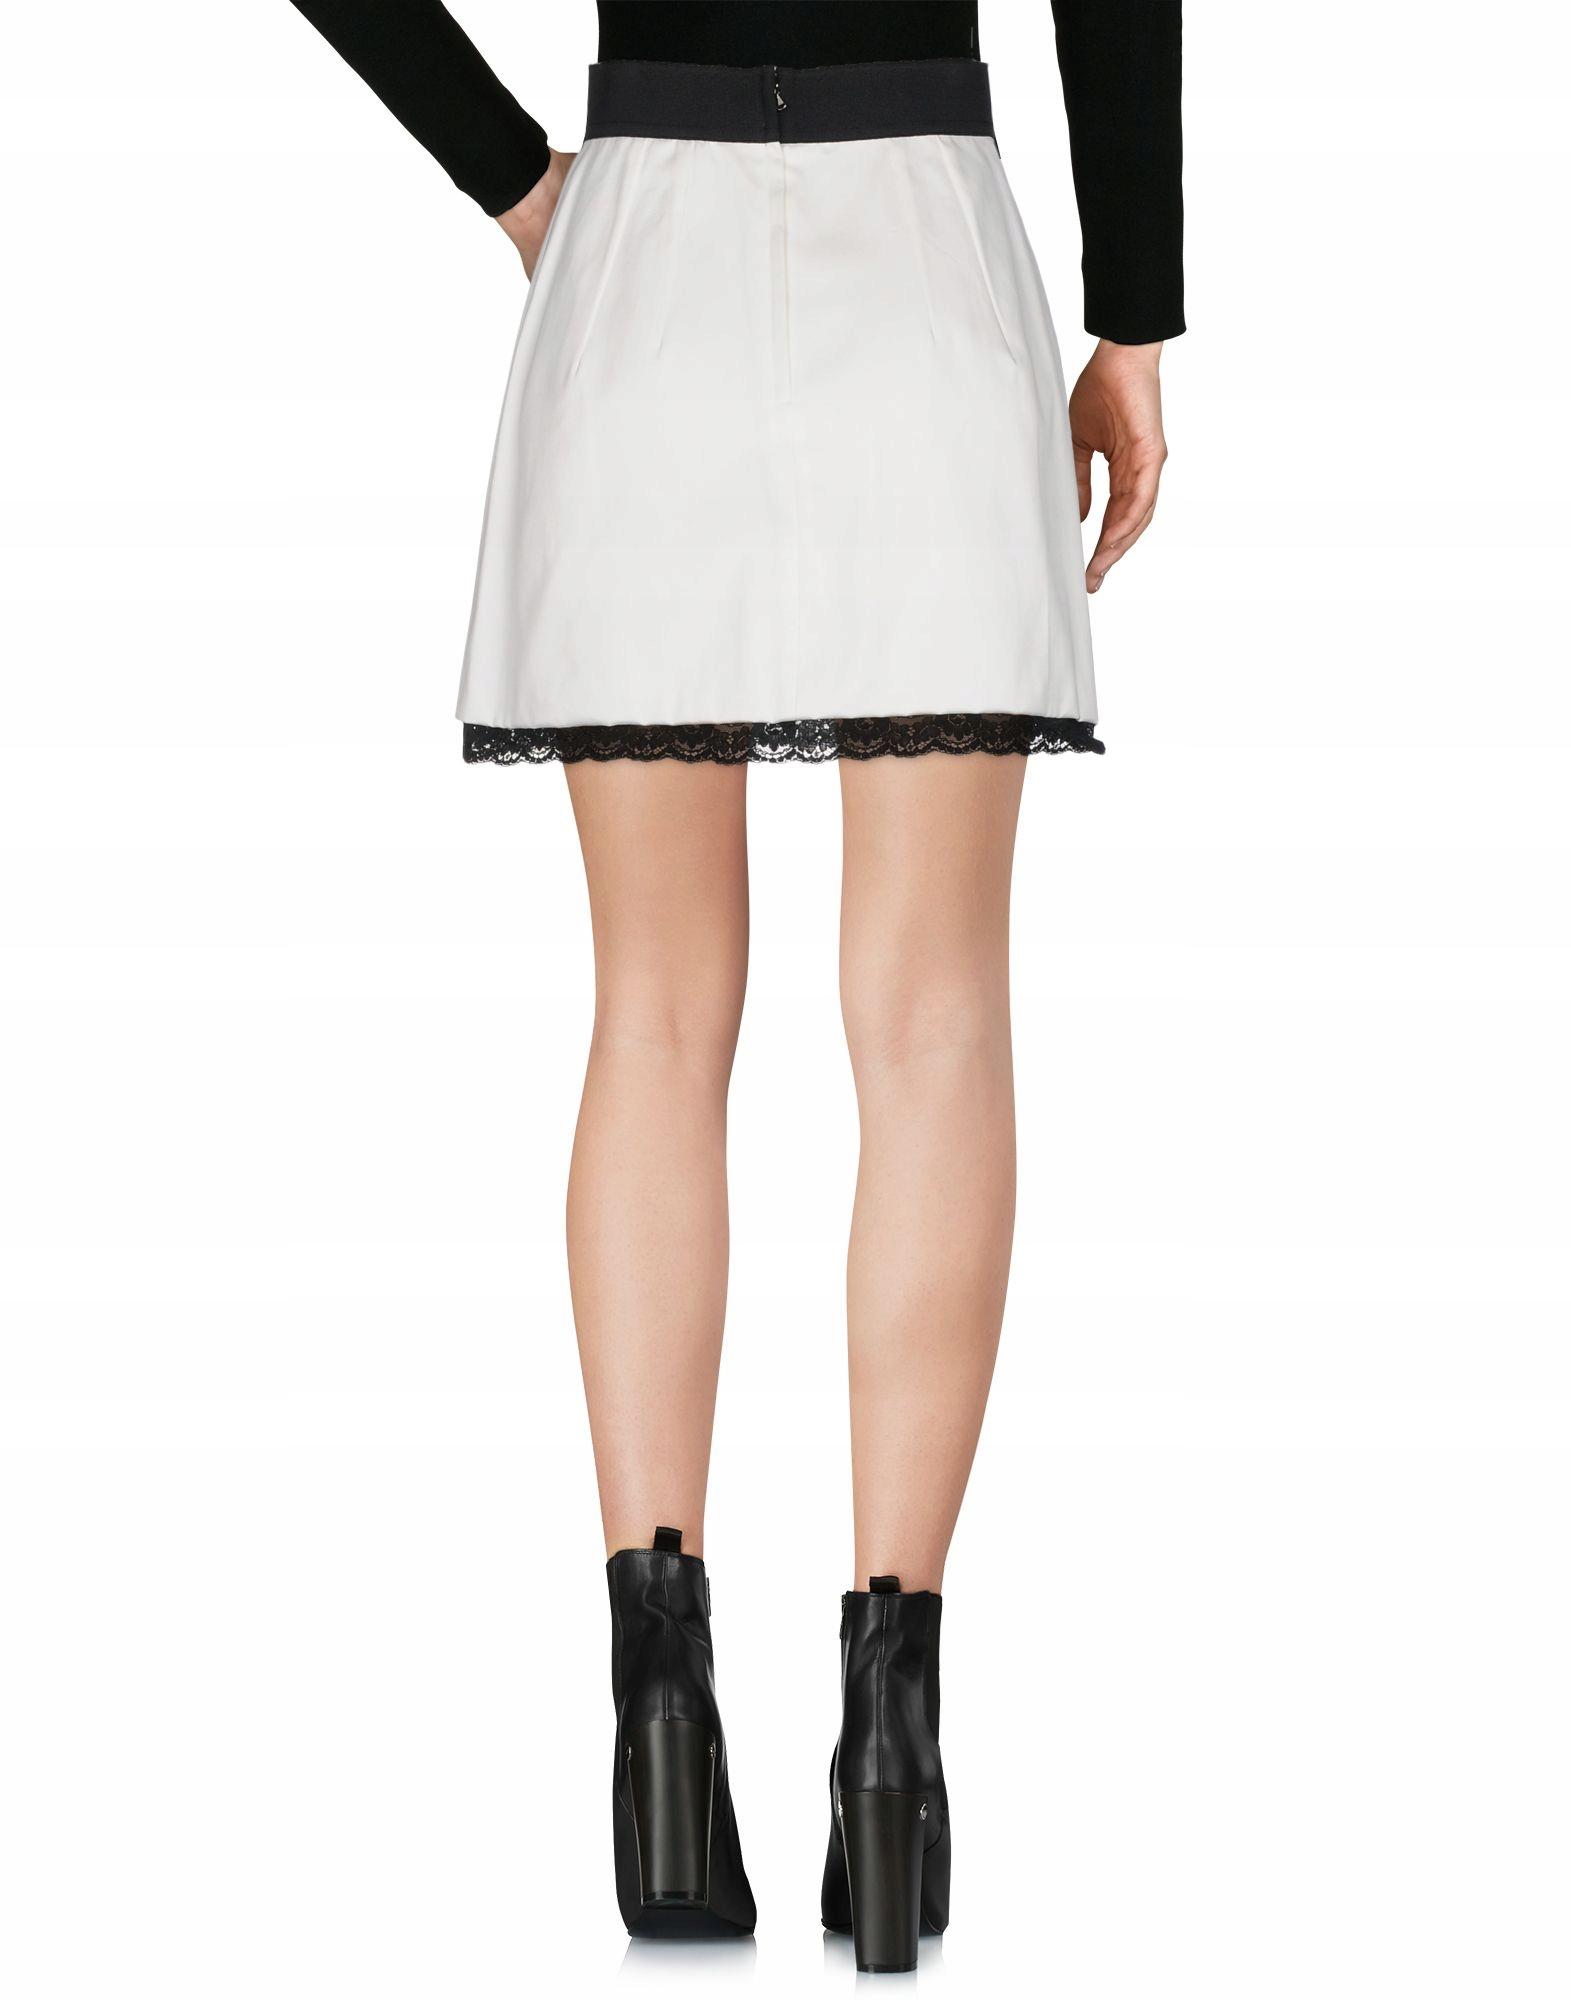 Dolce & Gabbana spódnica  nowa 38-40